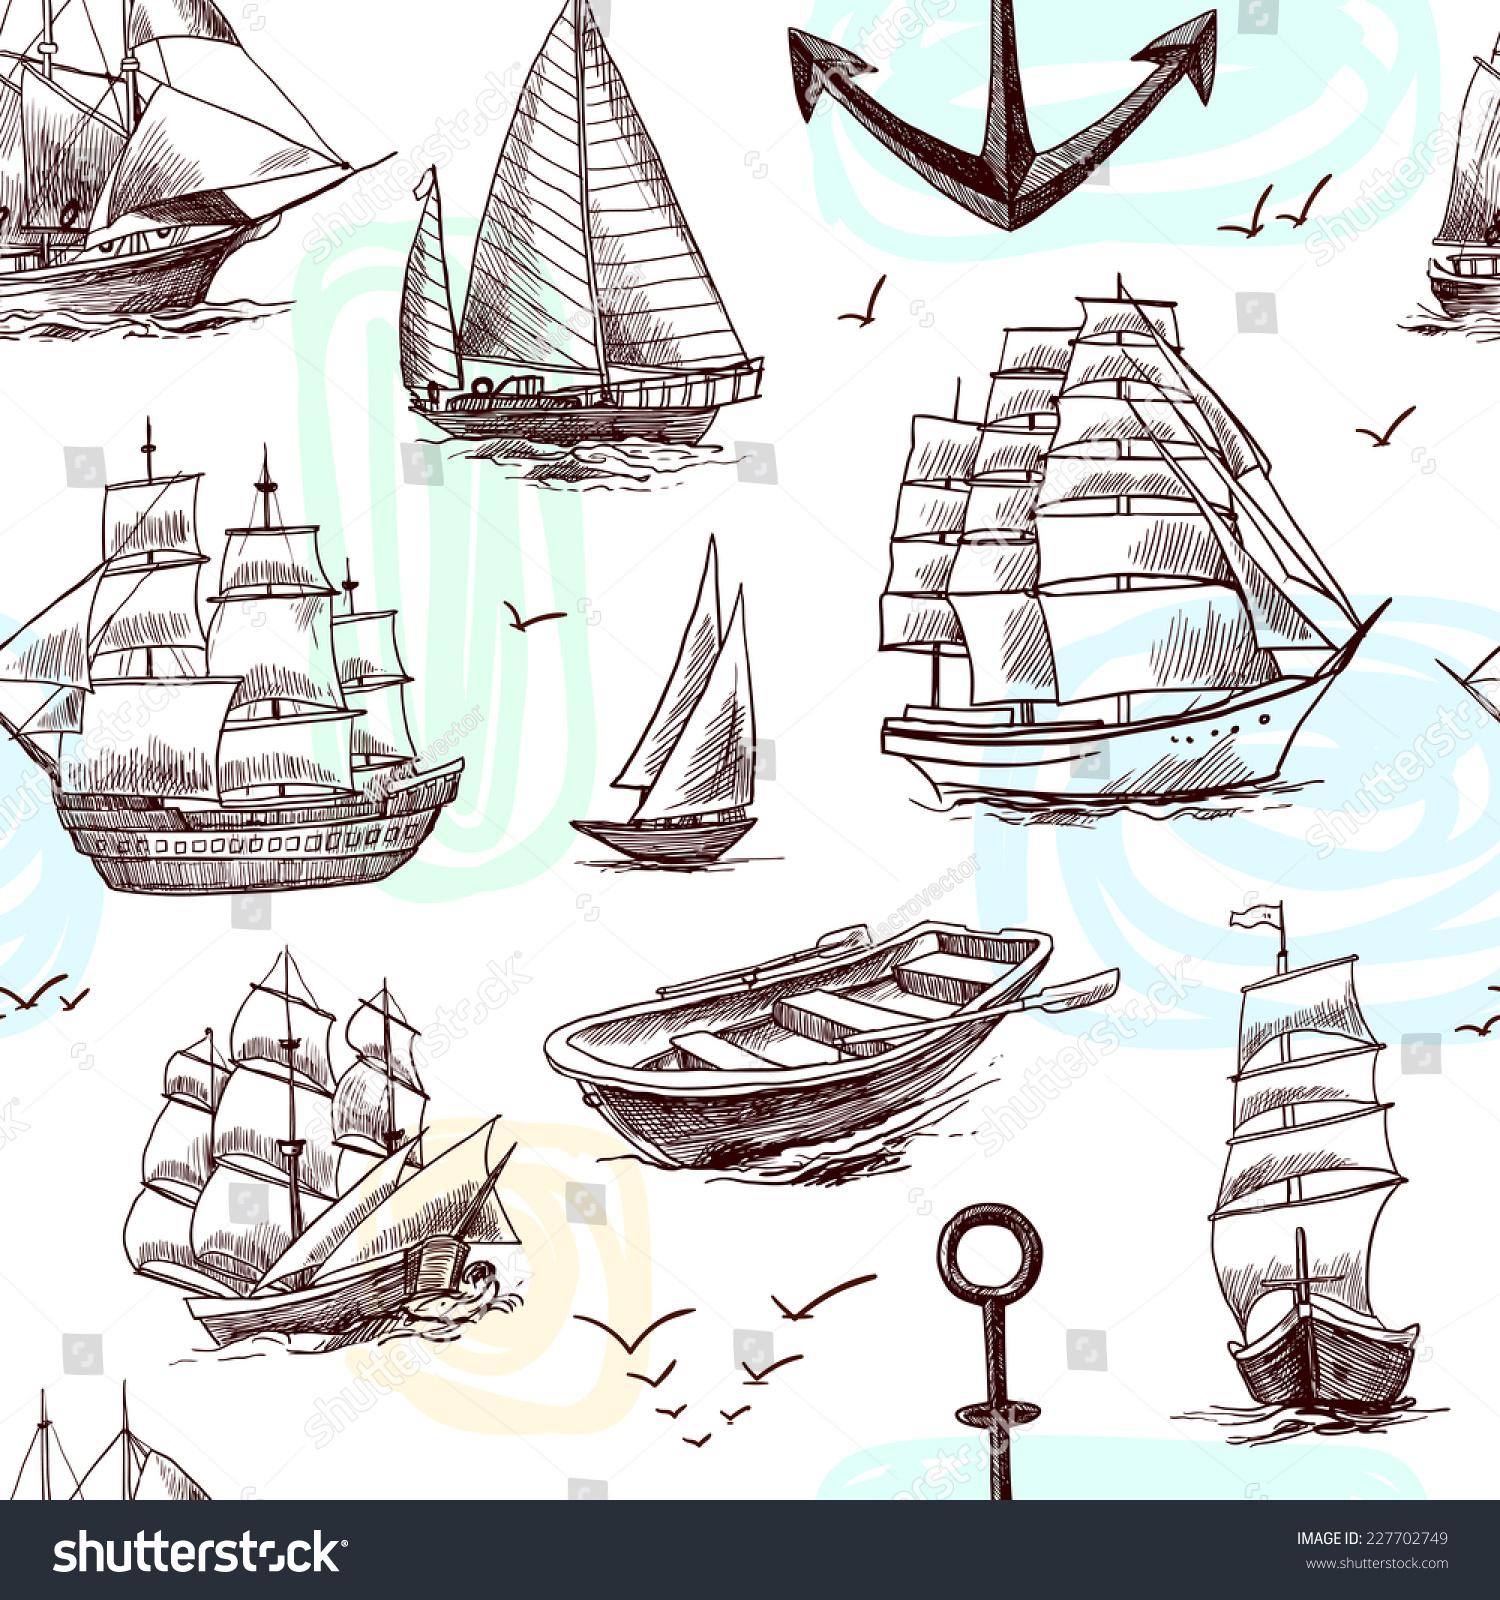 Sailing tall ships yachts and boat sketch decorative elements